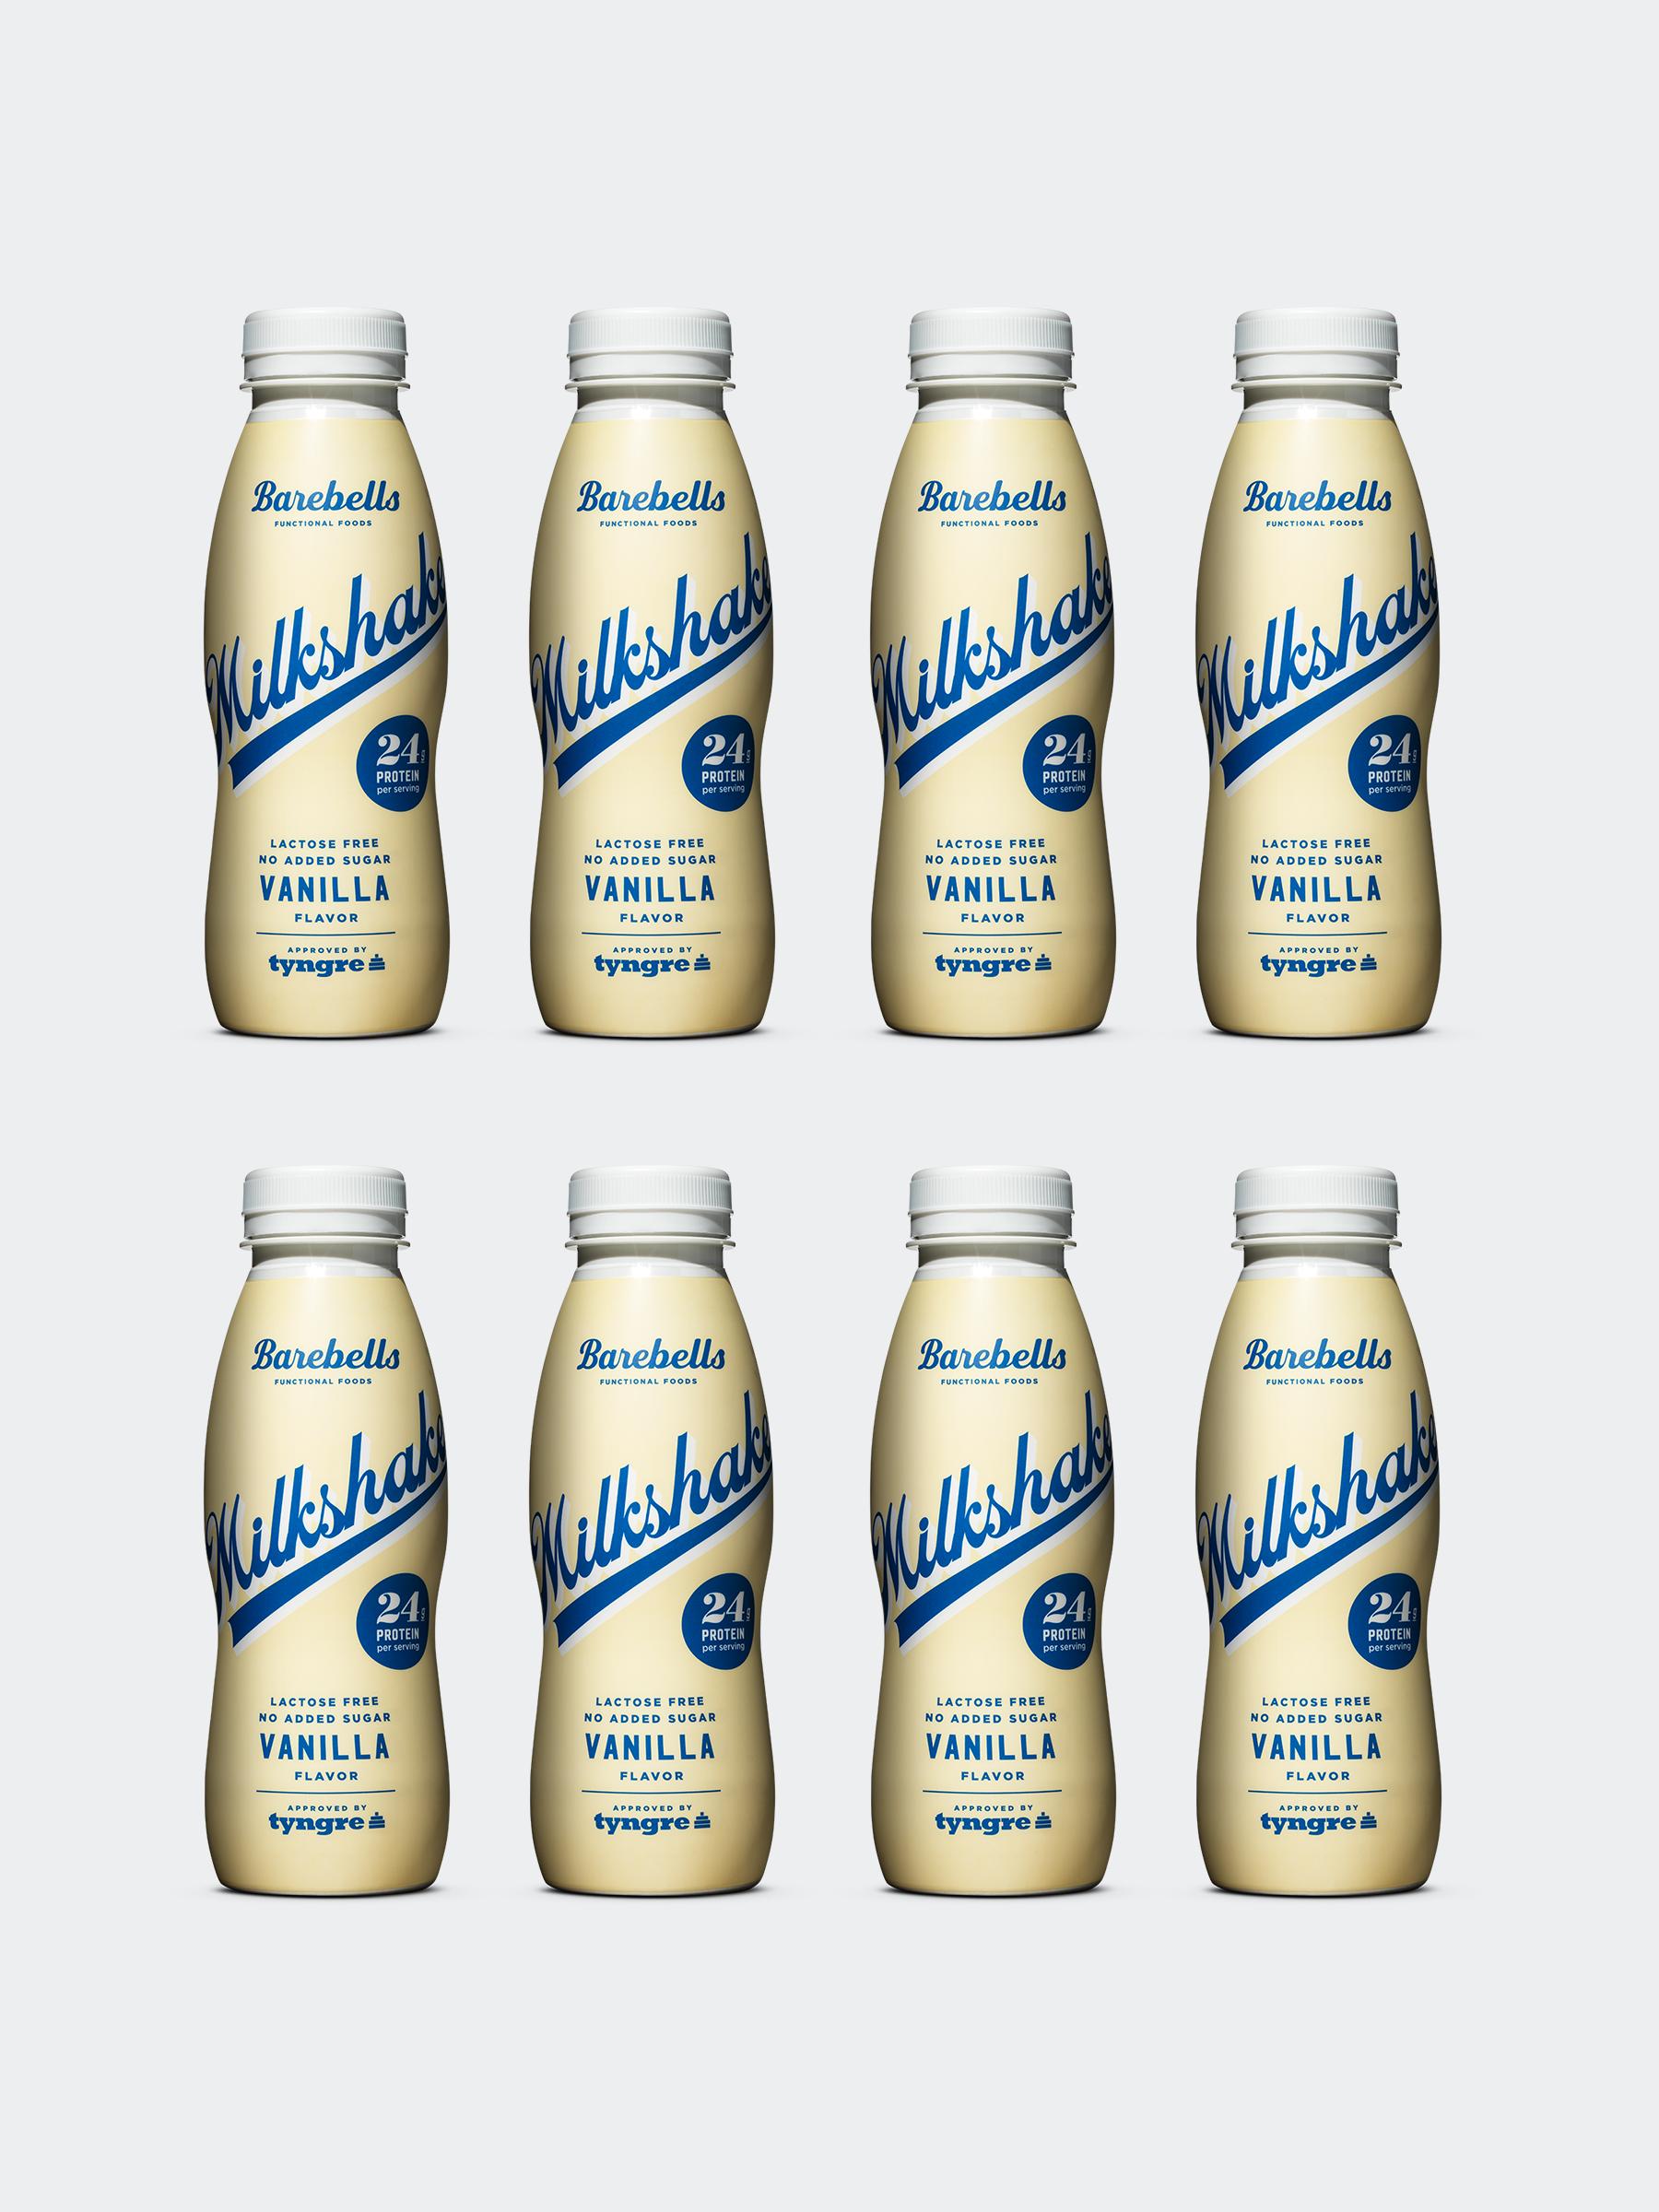 Barebells Milkshake Vanilla 8-pack